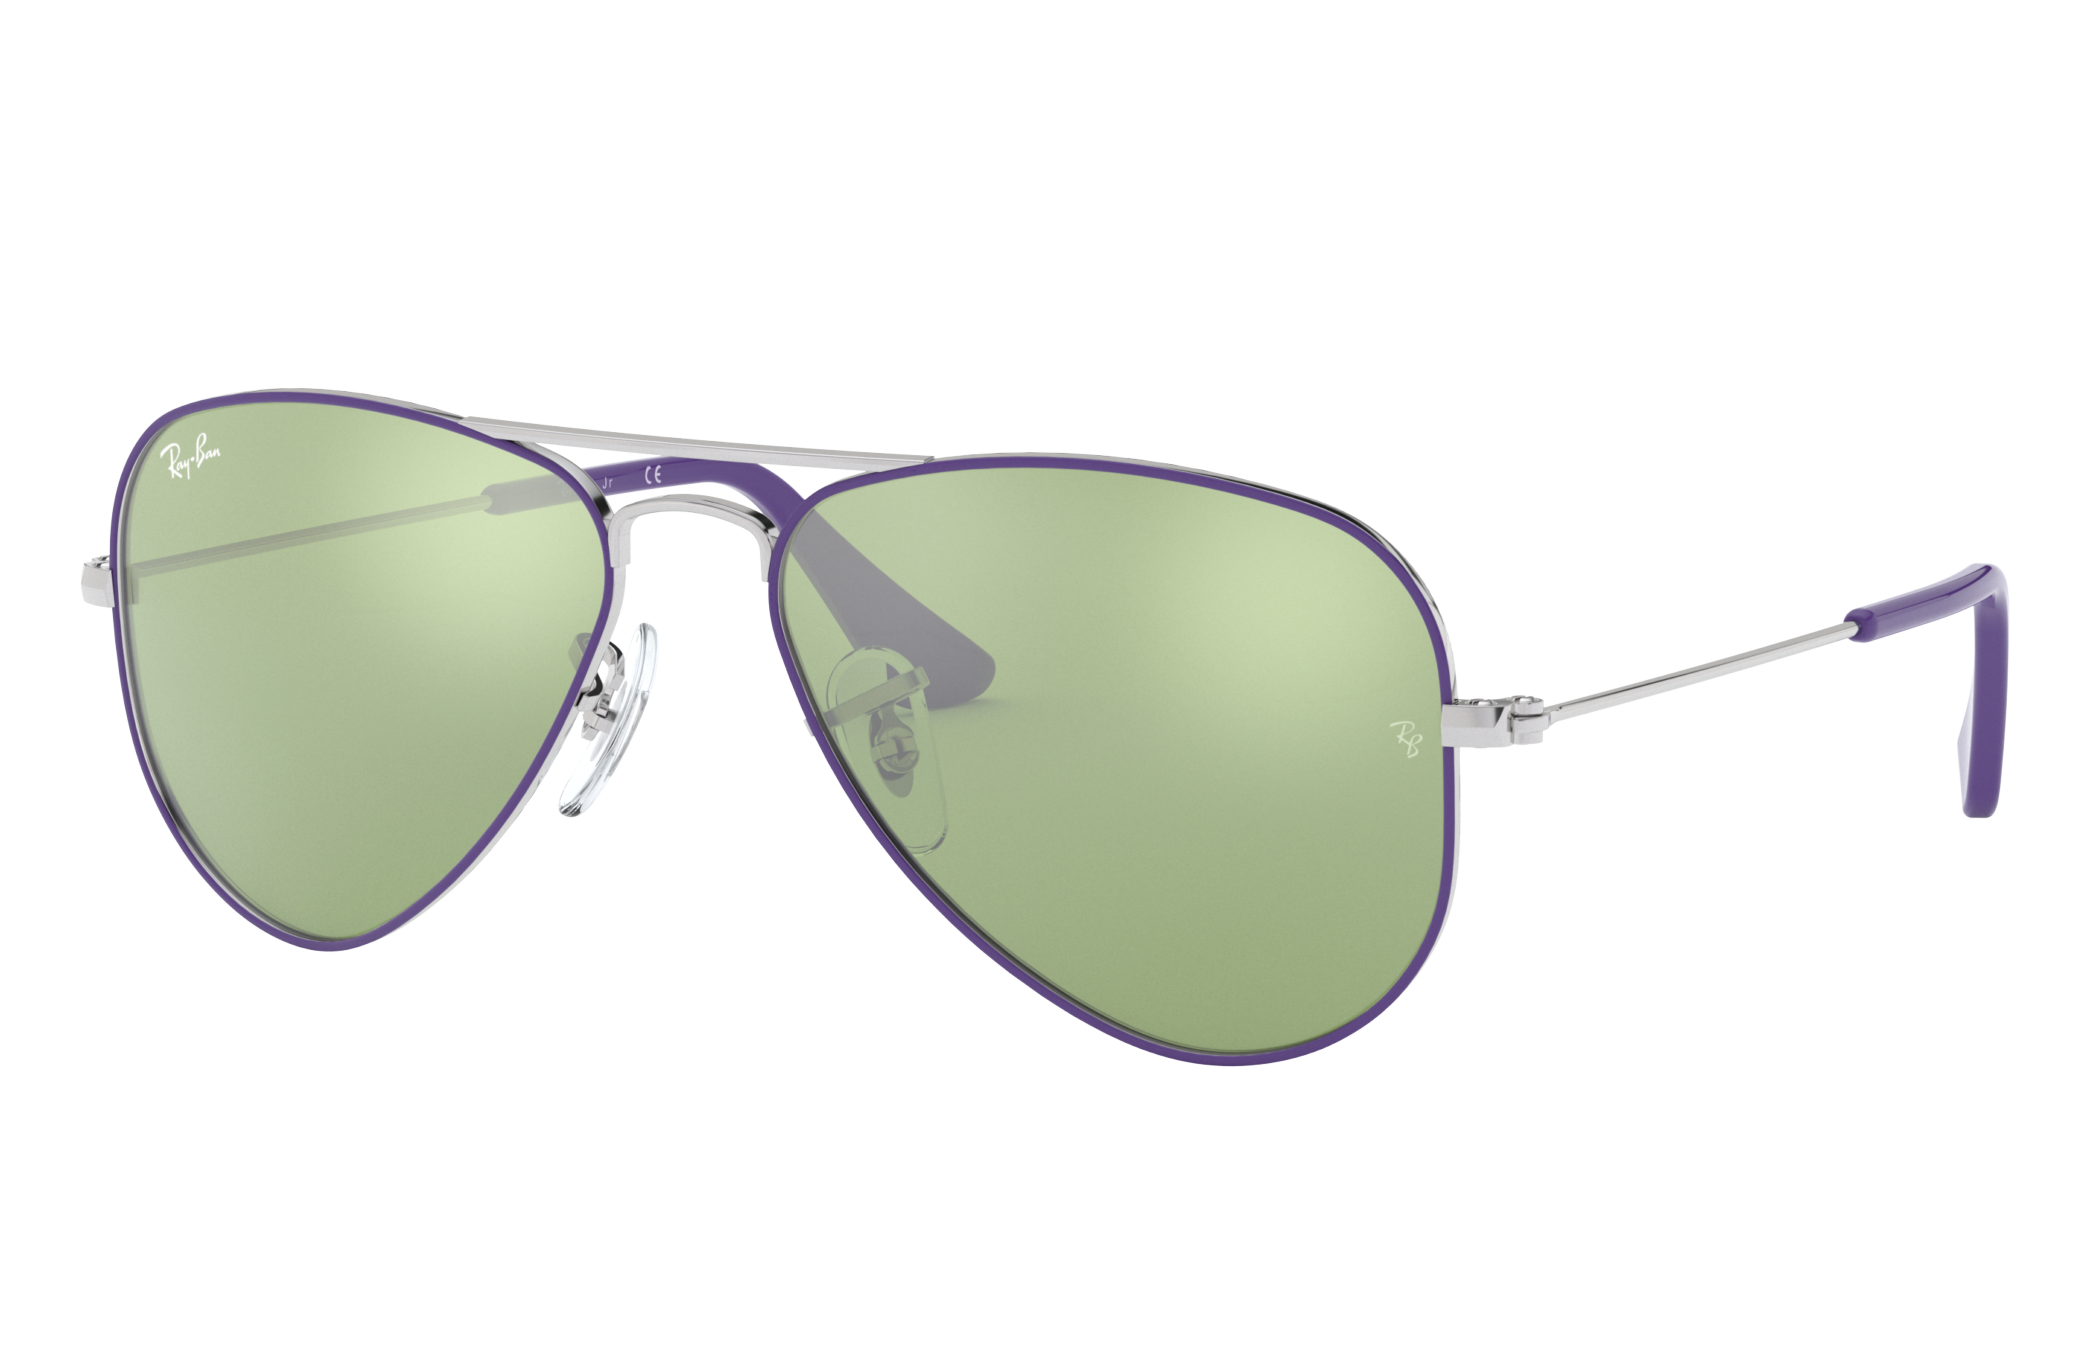 Ray-Ban Aviator Junior Silver, Green Lenses - RJ9506S